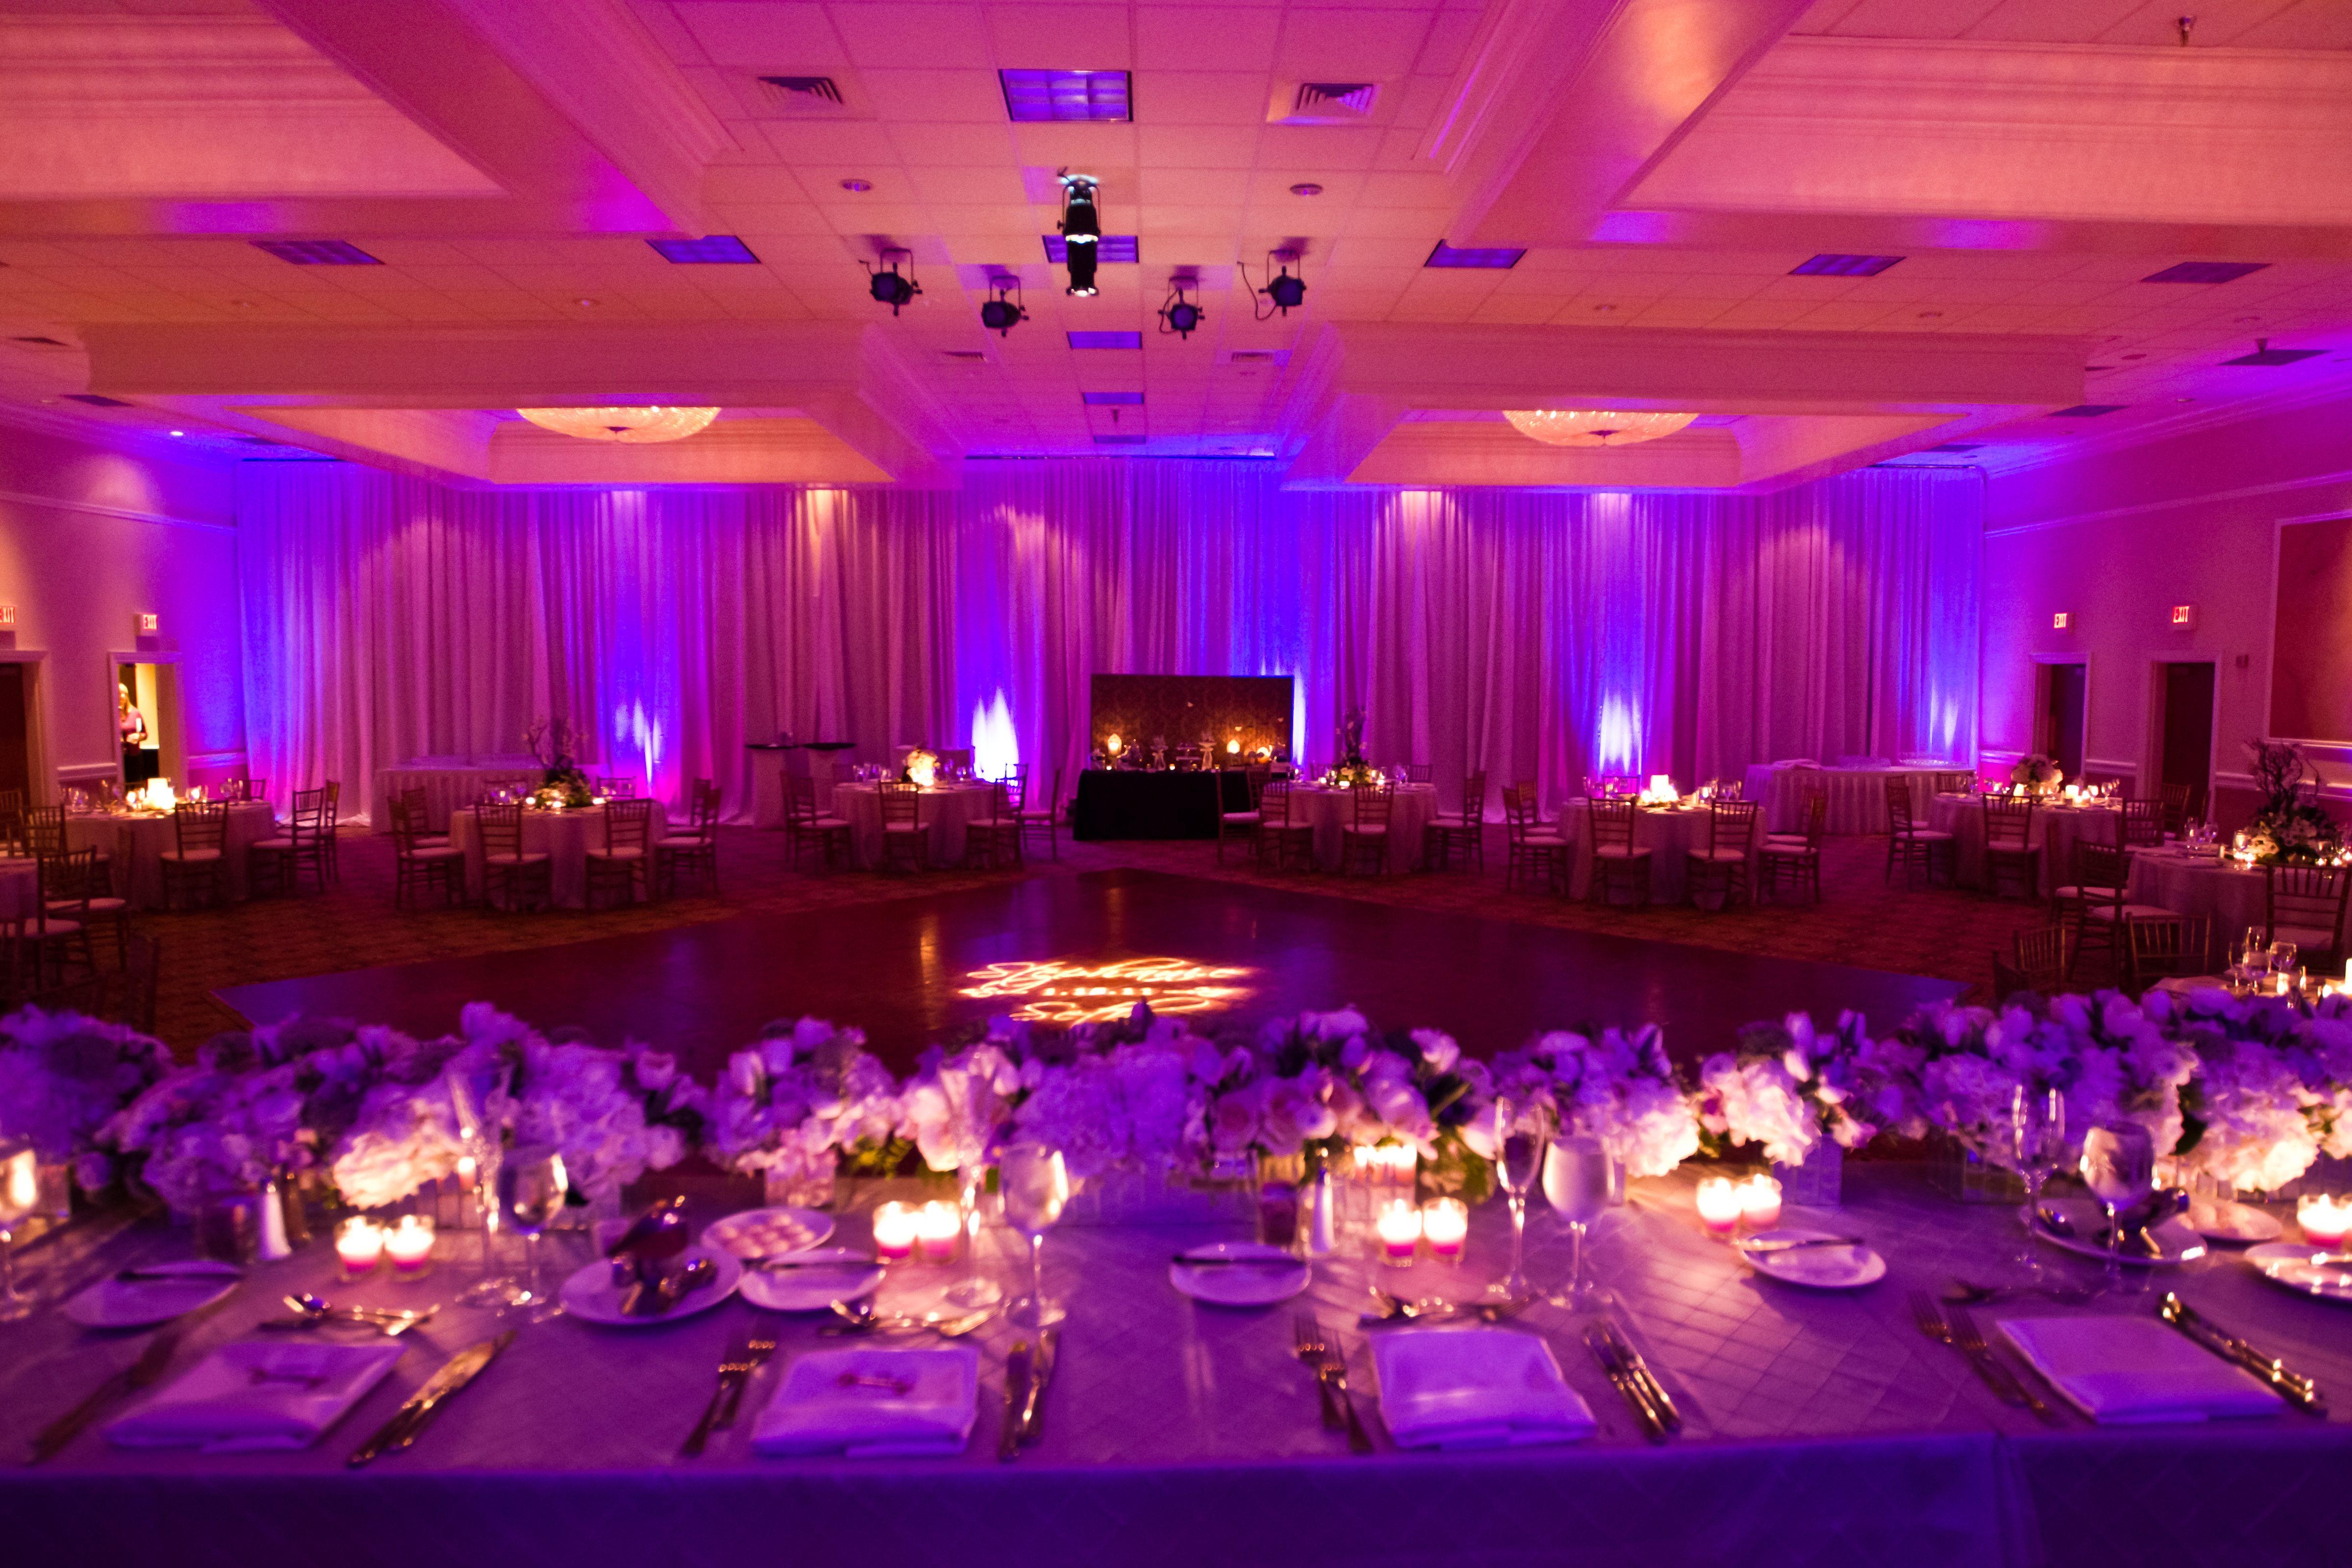 Wedding decorations for hall  burkle events wedding planner  purple wedding reception decor photo